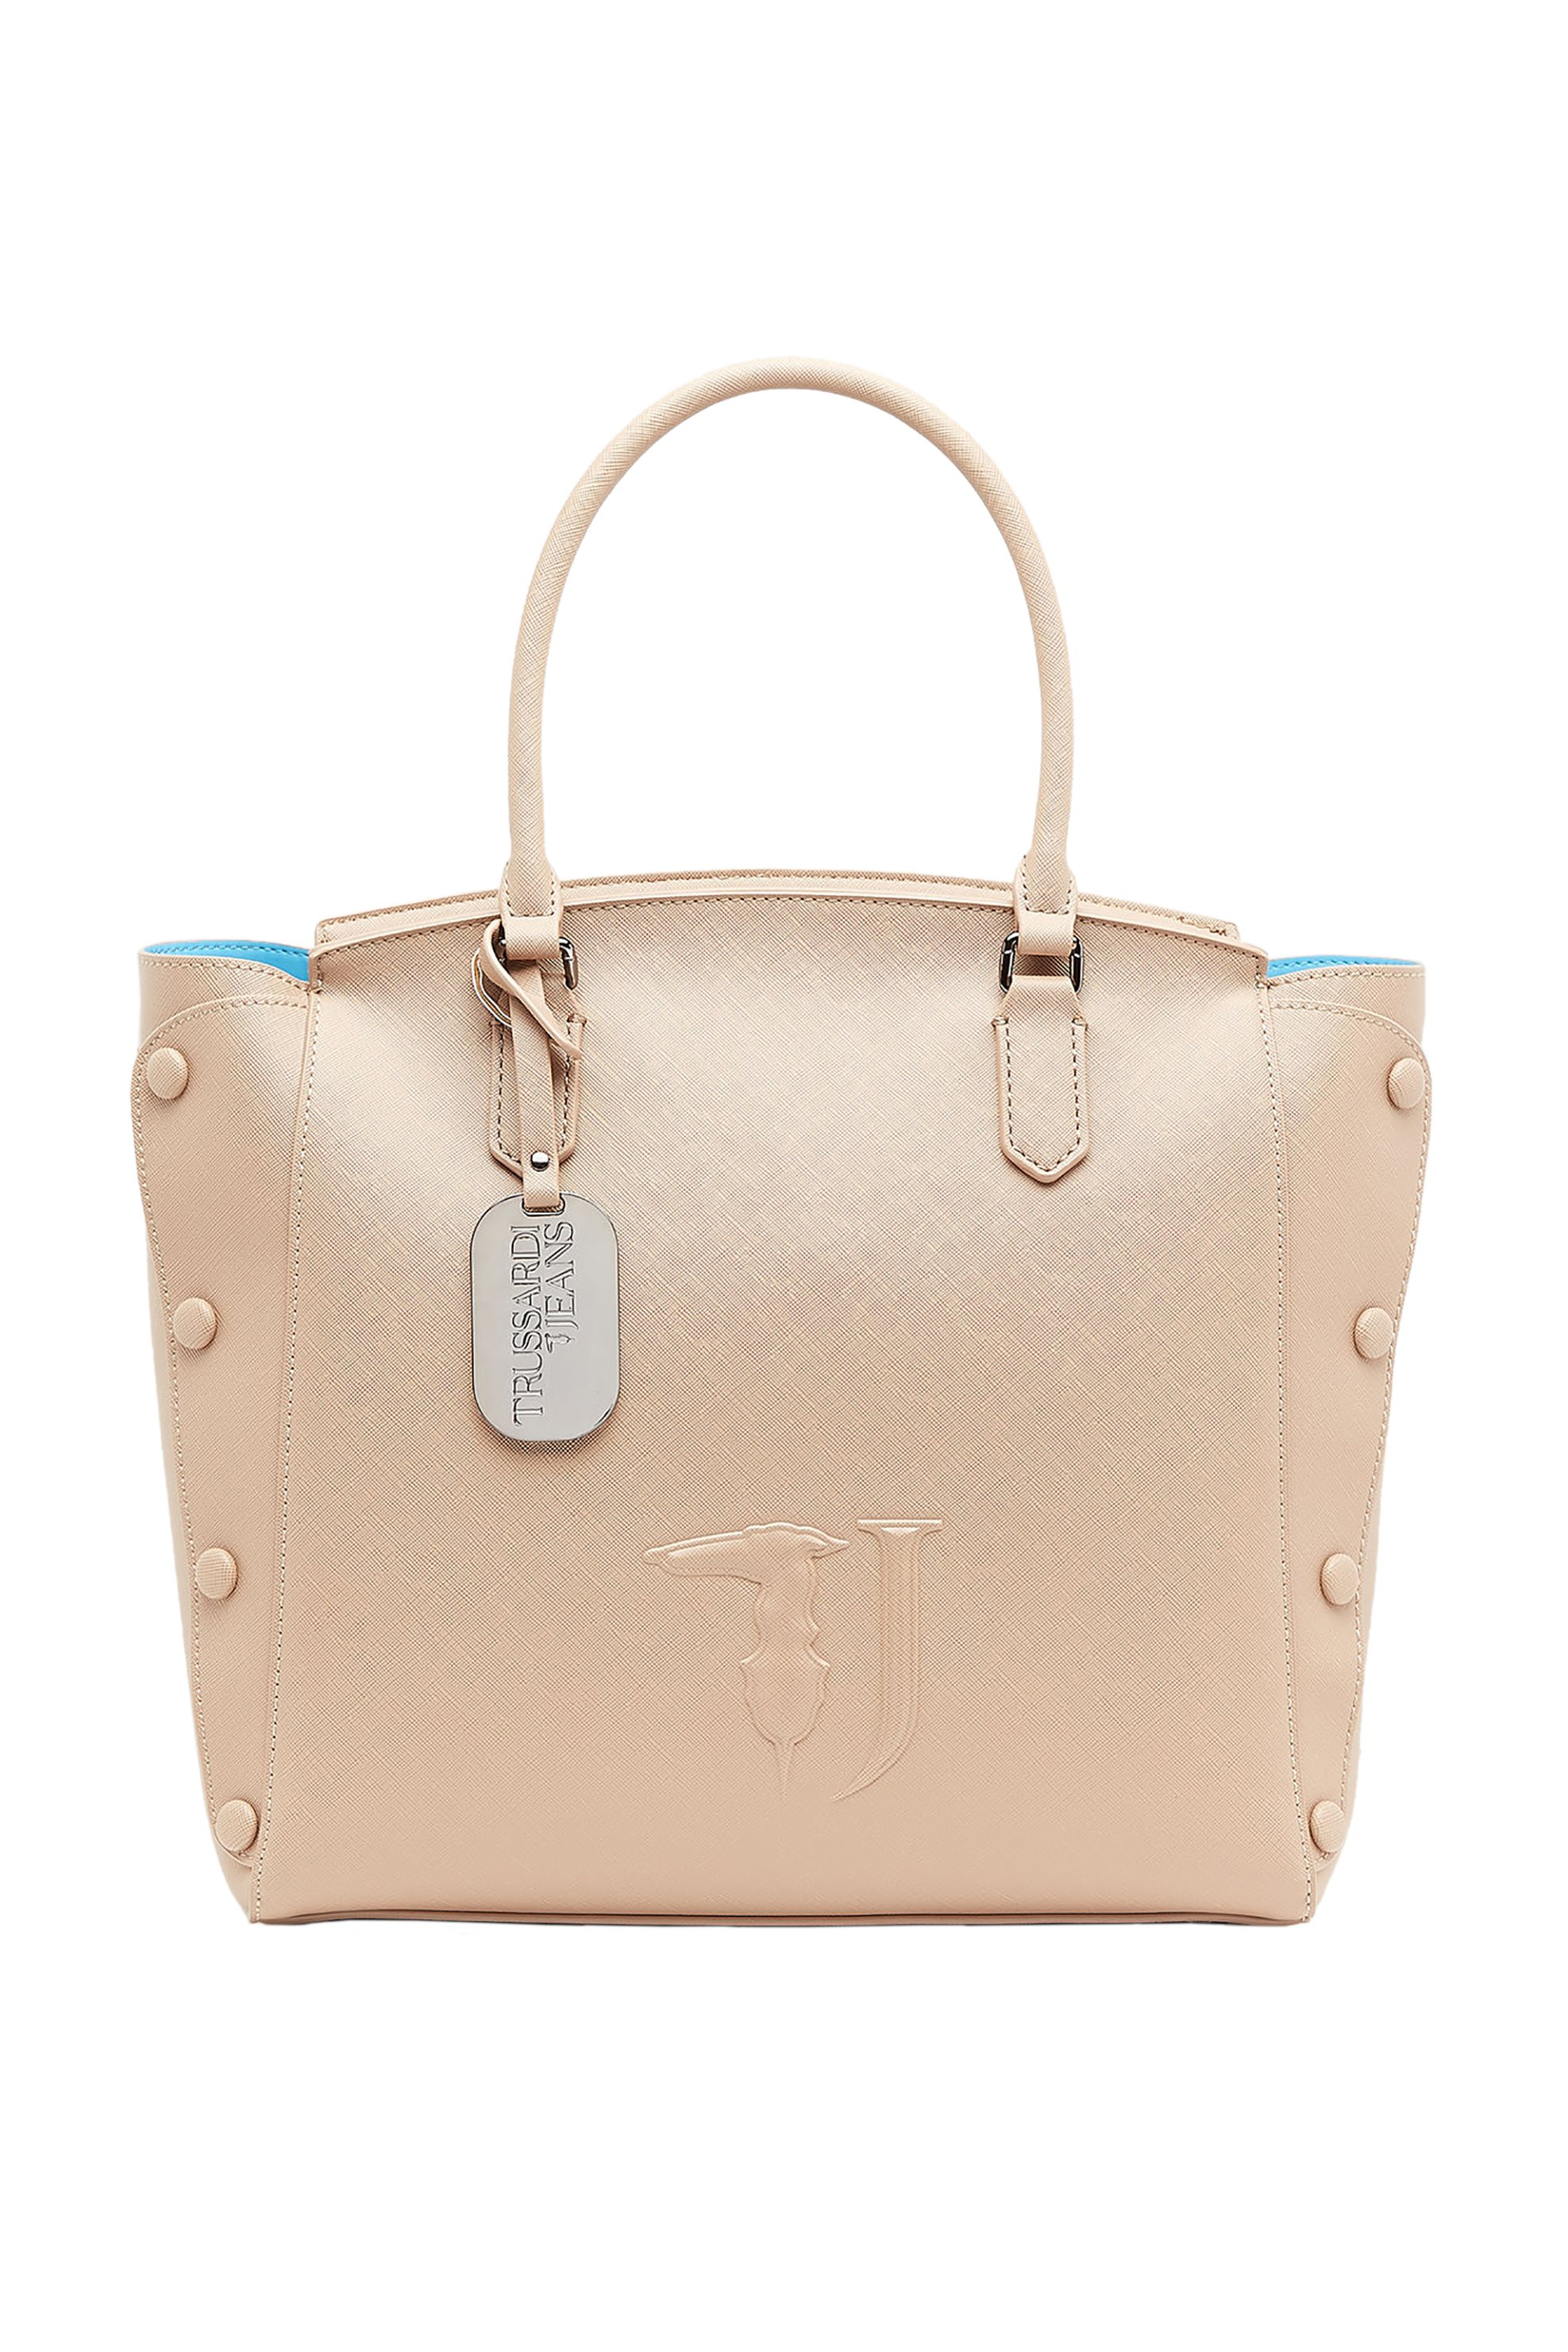 Trussardi Jeans γυναικεία shopping bag Μelissa - 75B00452-9Y099999 - Μπεζ γυναικα   τσαντεσ   ώμου   shopper bags